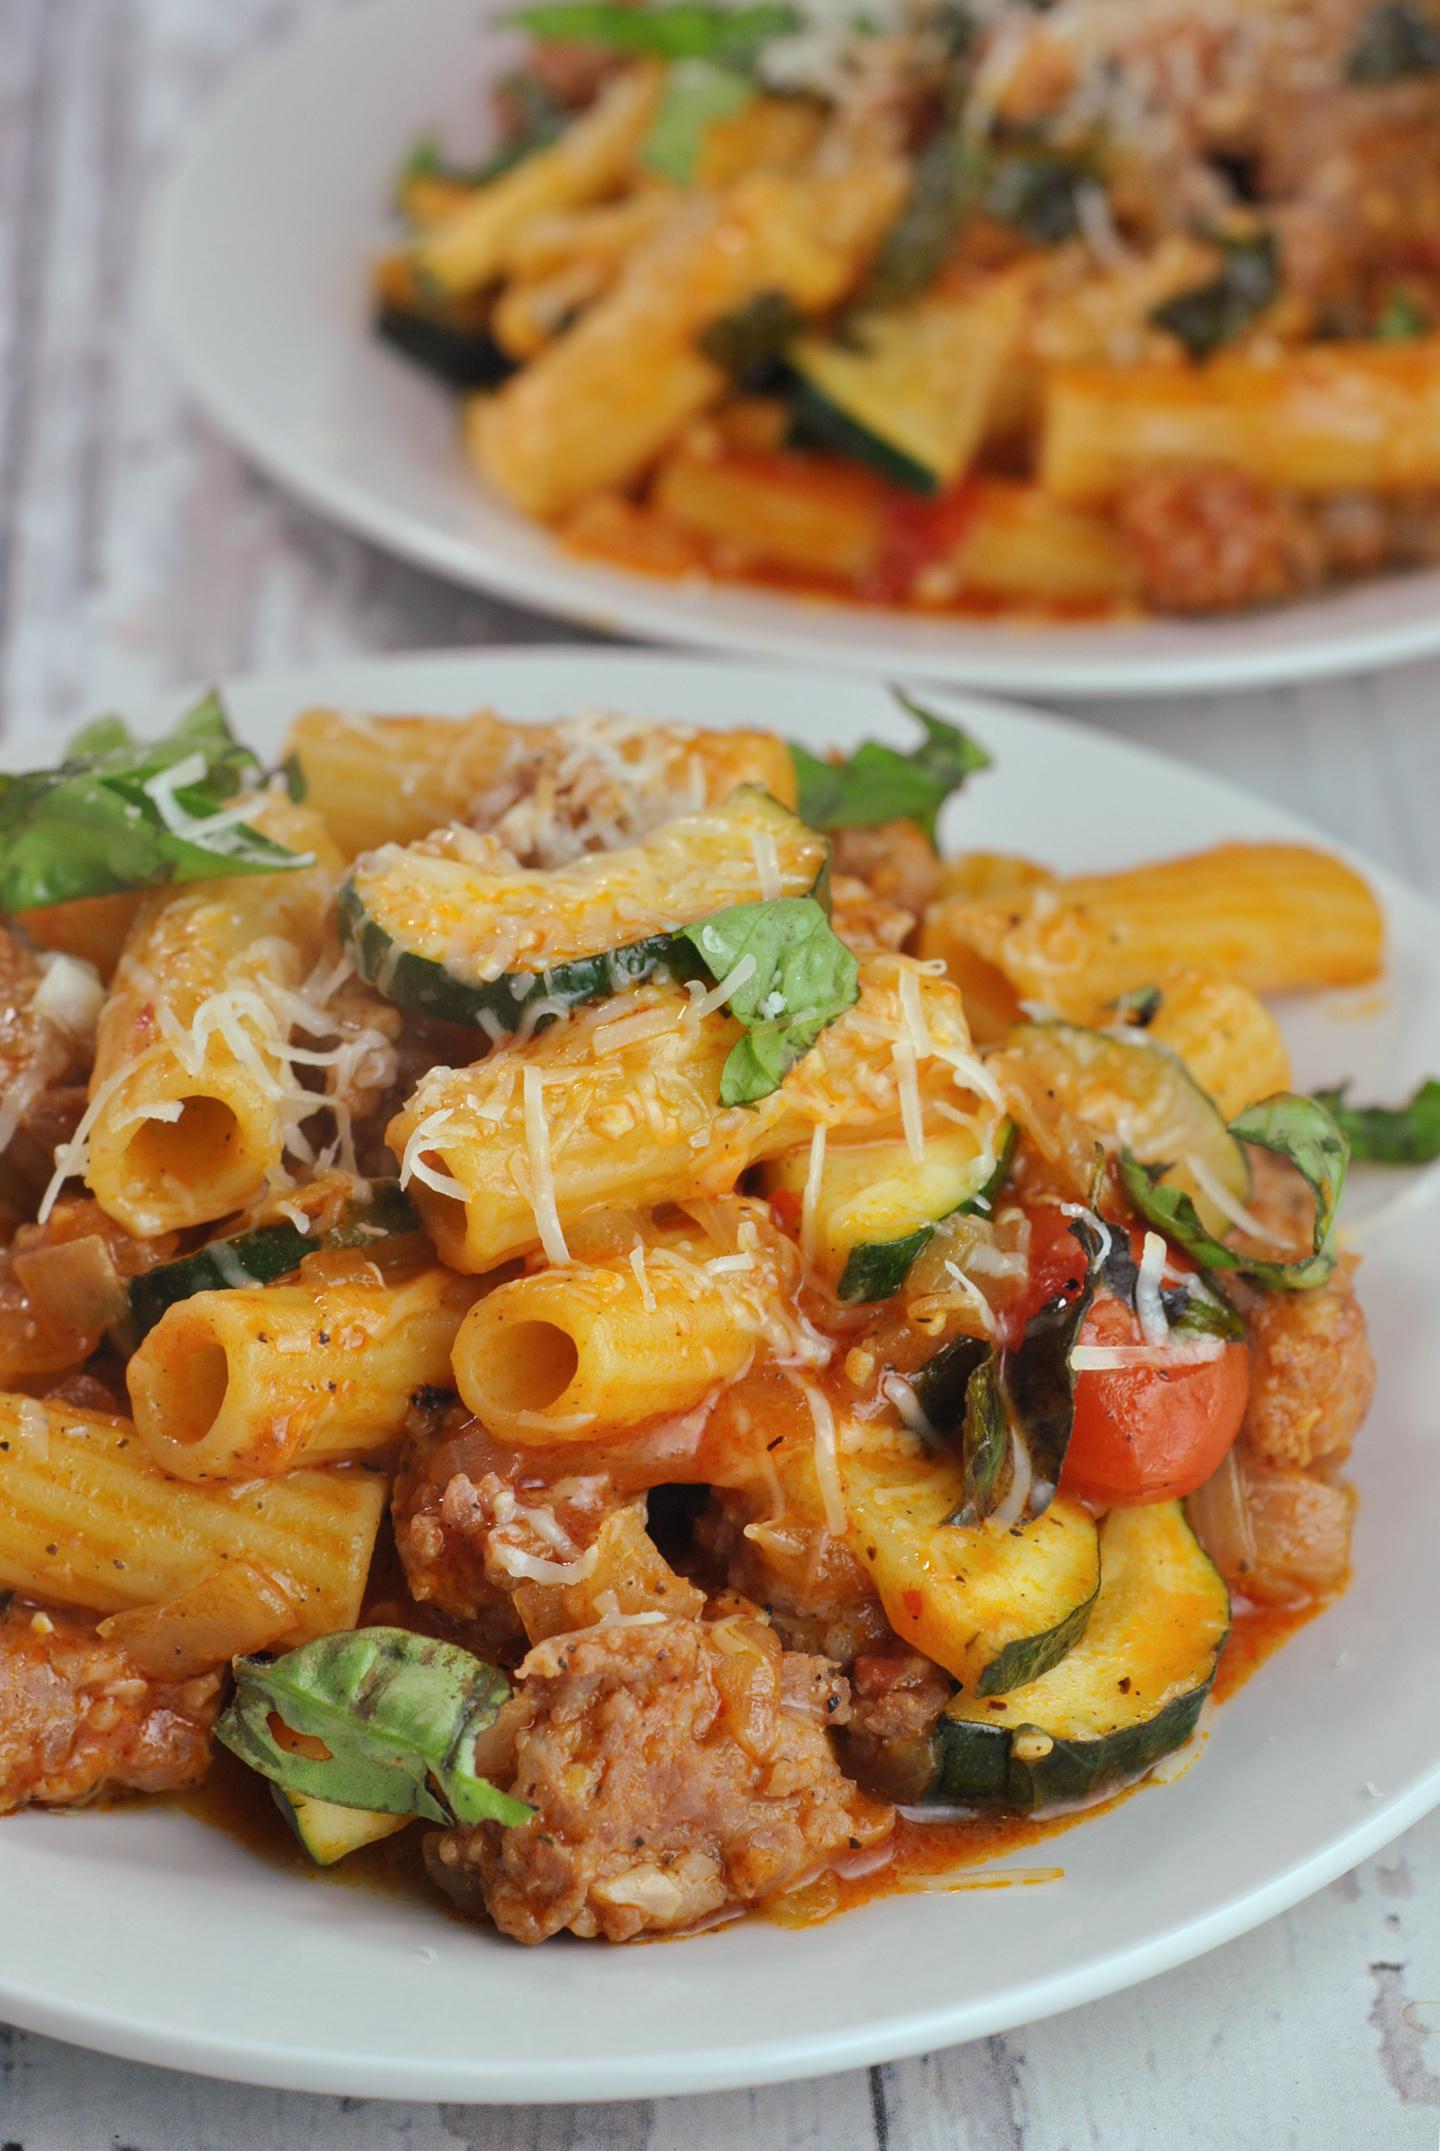 Rigatoni with Turkey Sausage, Tomatoes, and Zucchini via @preventionrd